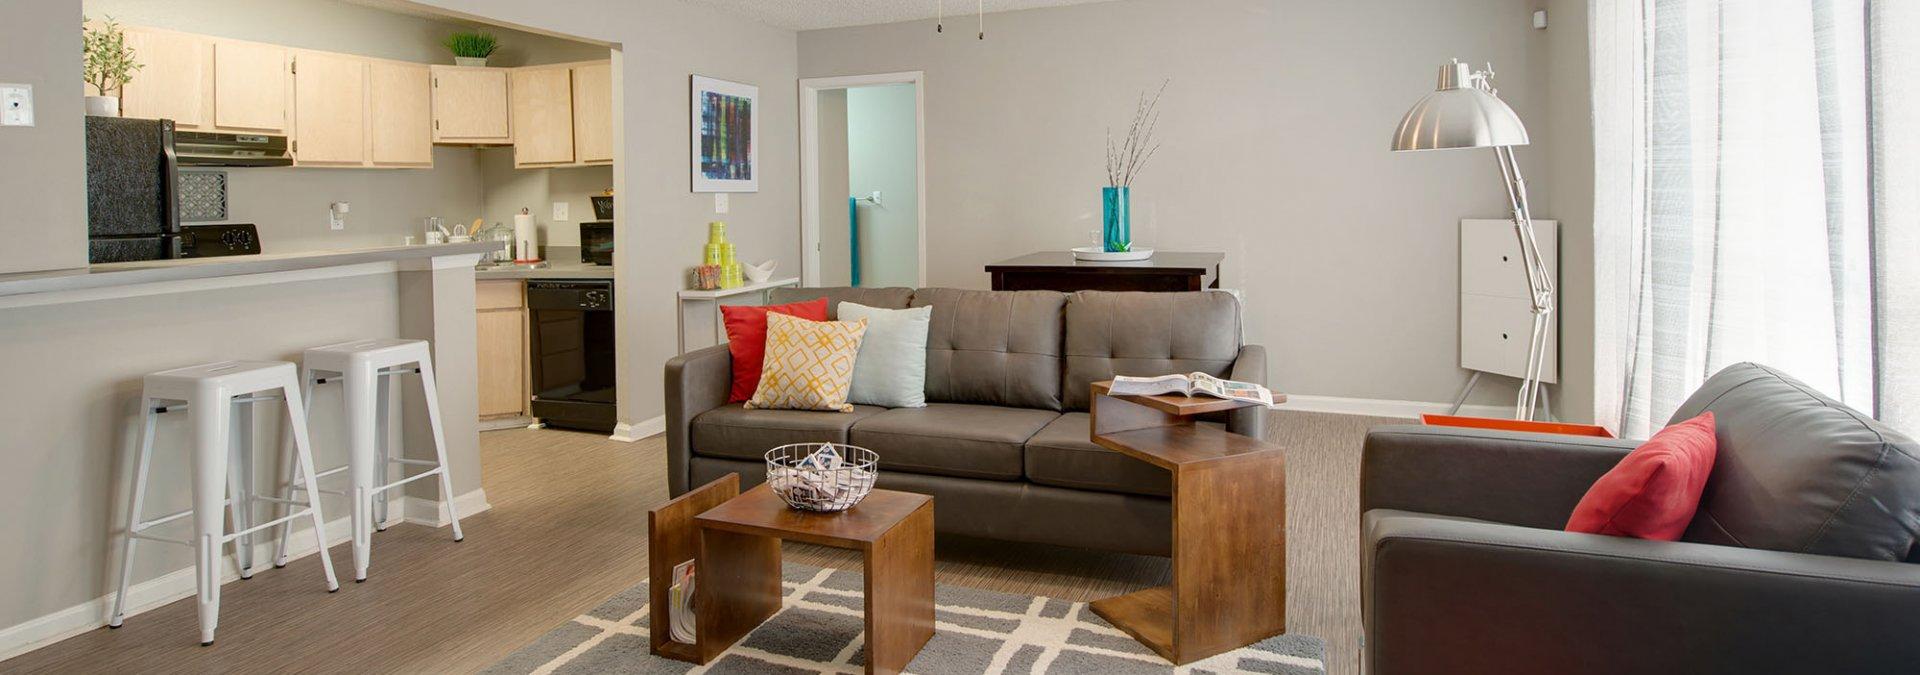 Elegant Living Room | 2 Bedroom Apartments In Auburn AL | The Hub at Auburn